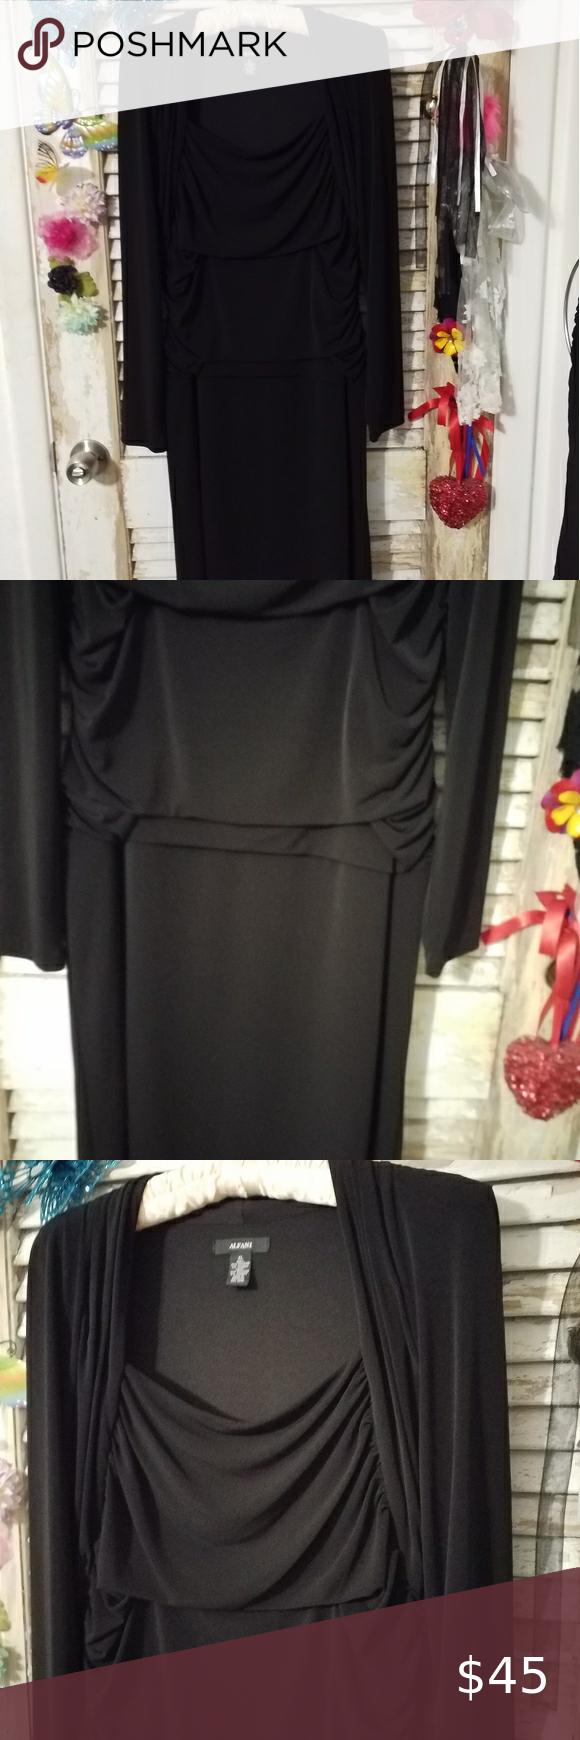 Alfani Xl Black Dress In 2020 Alfani Dress Black Dress Clothes Design [ 1740 x 580 Pixel ]